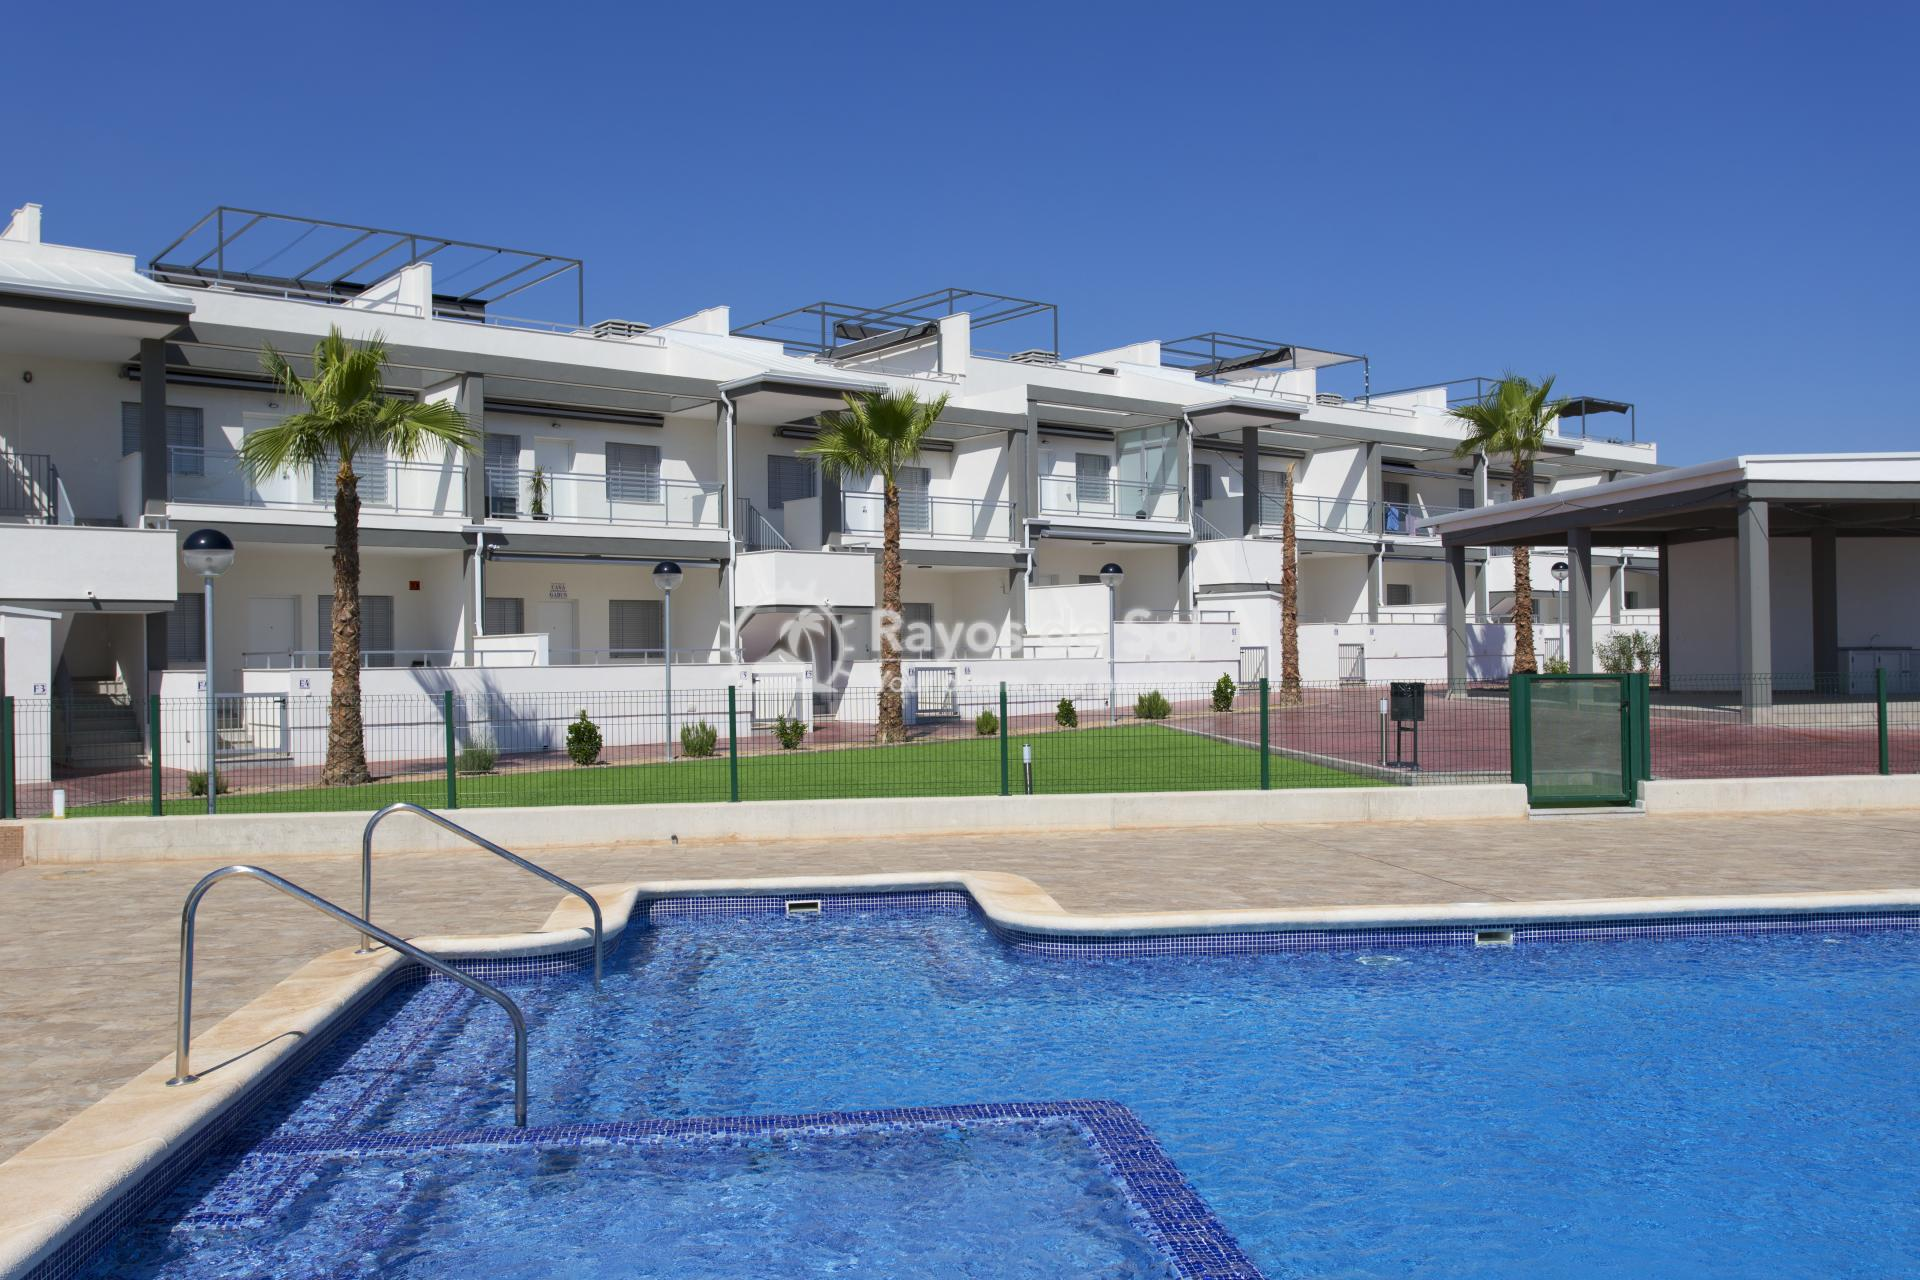 Appartement begane grond  in La Florida, Orihuela Costa, Costa Blanca (Oasis place BG3-2) - 24